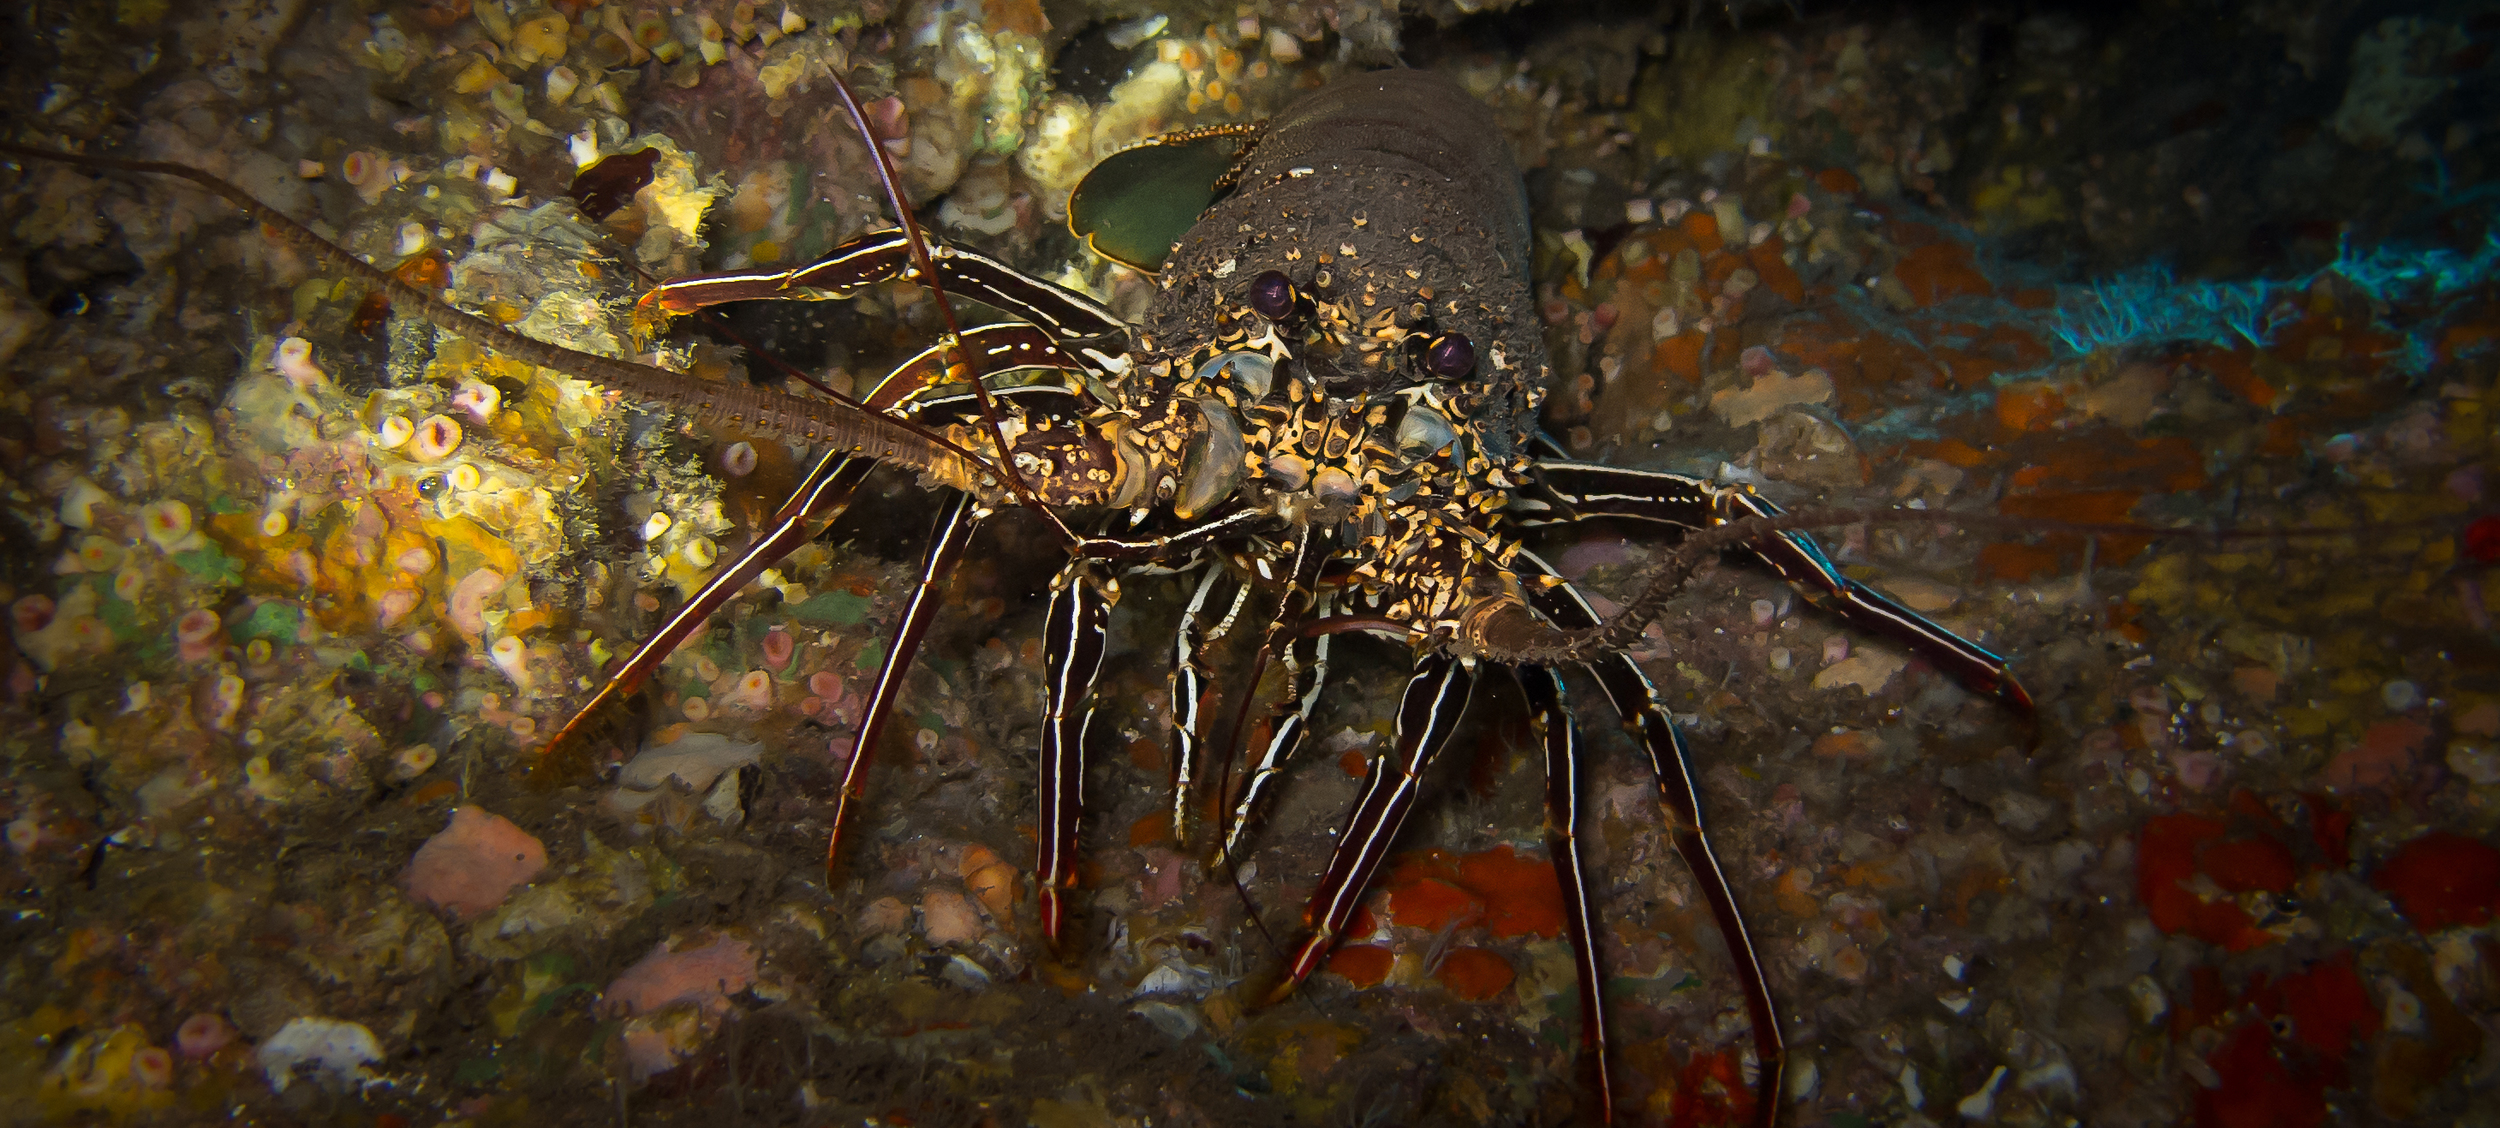 Tufted Spiny Lobster_20130916(Crop).jpg